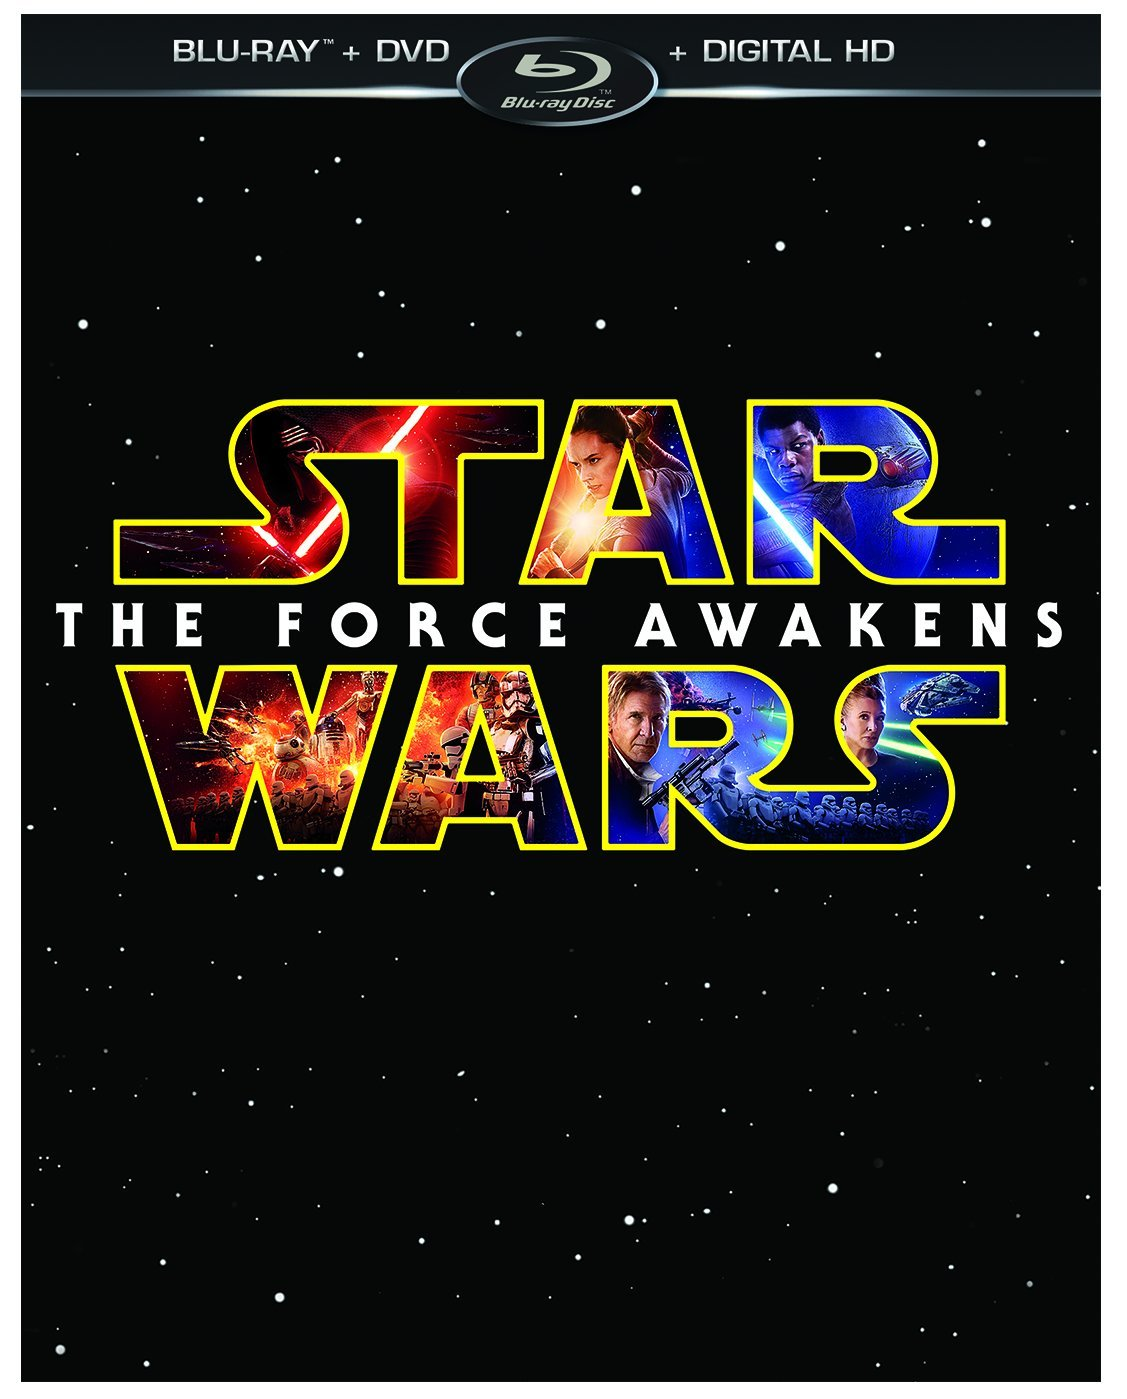 Star Wars: The Force Awakens on Blu Ray & DVD